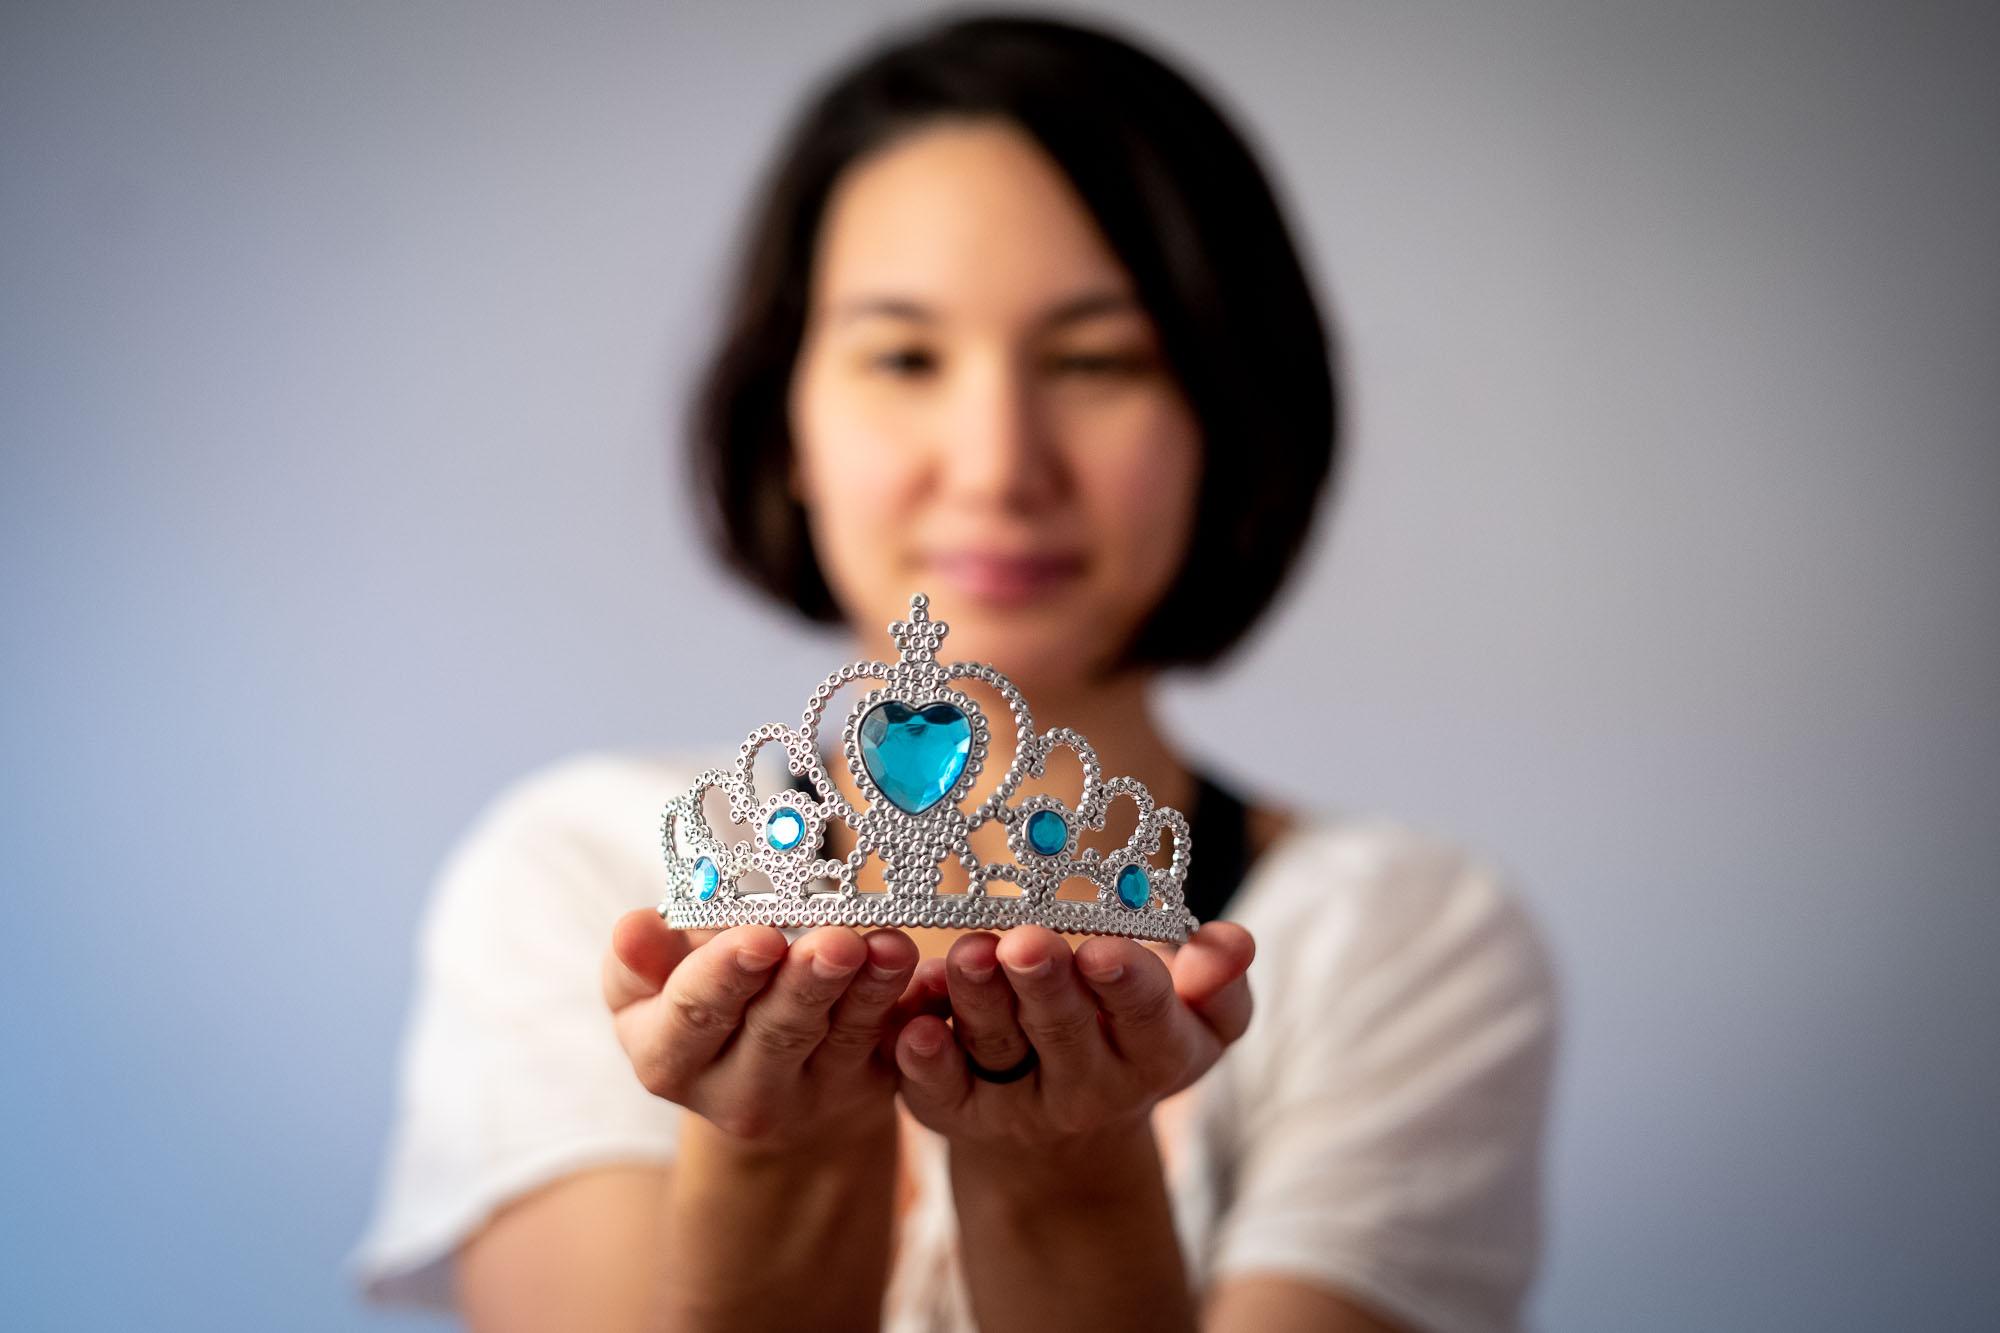 Ulya presenting our dautgher's Elsa tiara